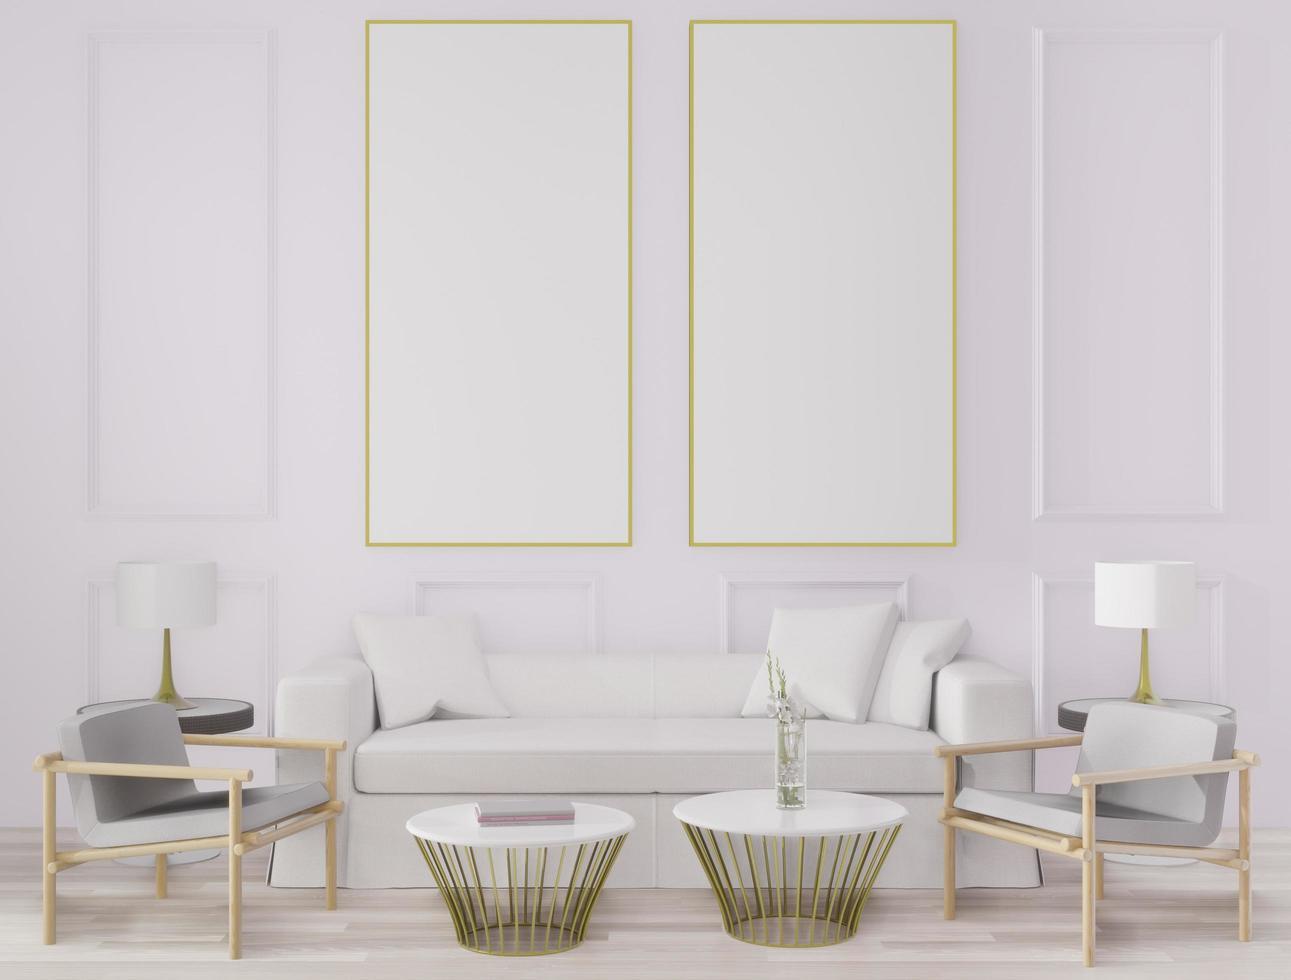 Illustrative interior design photo